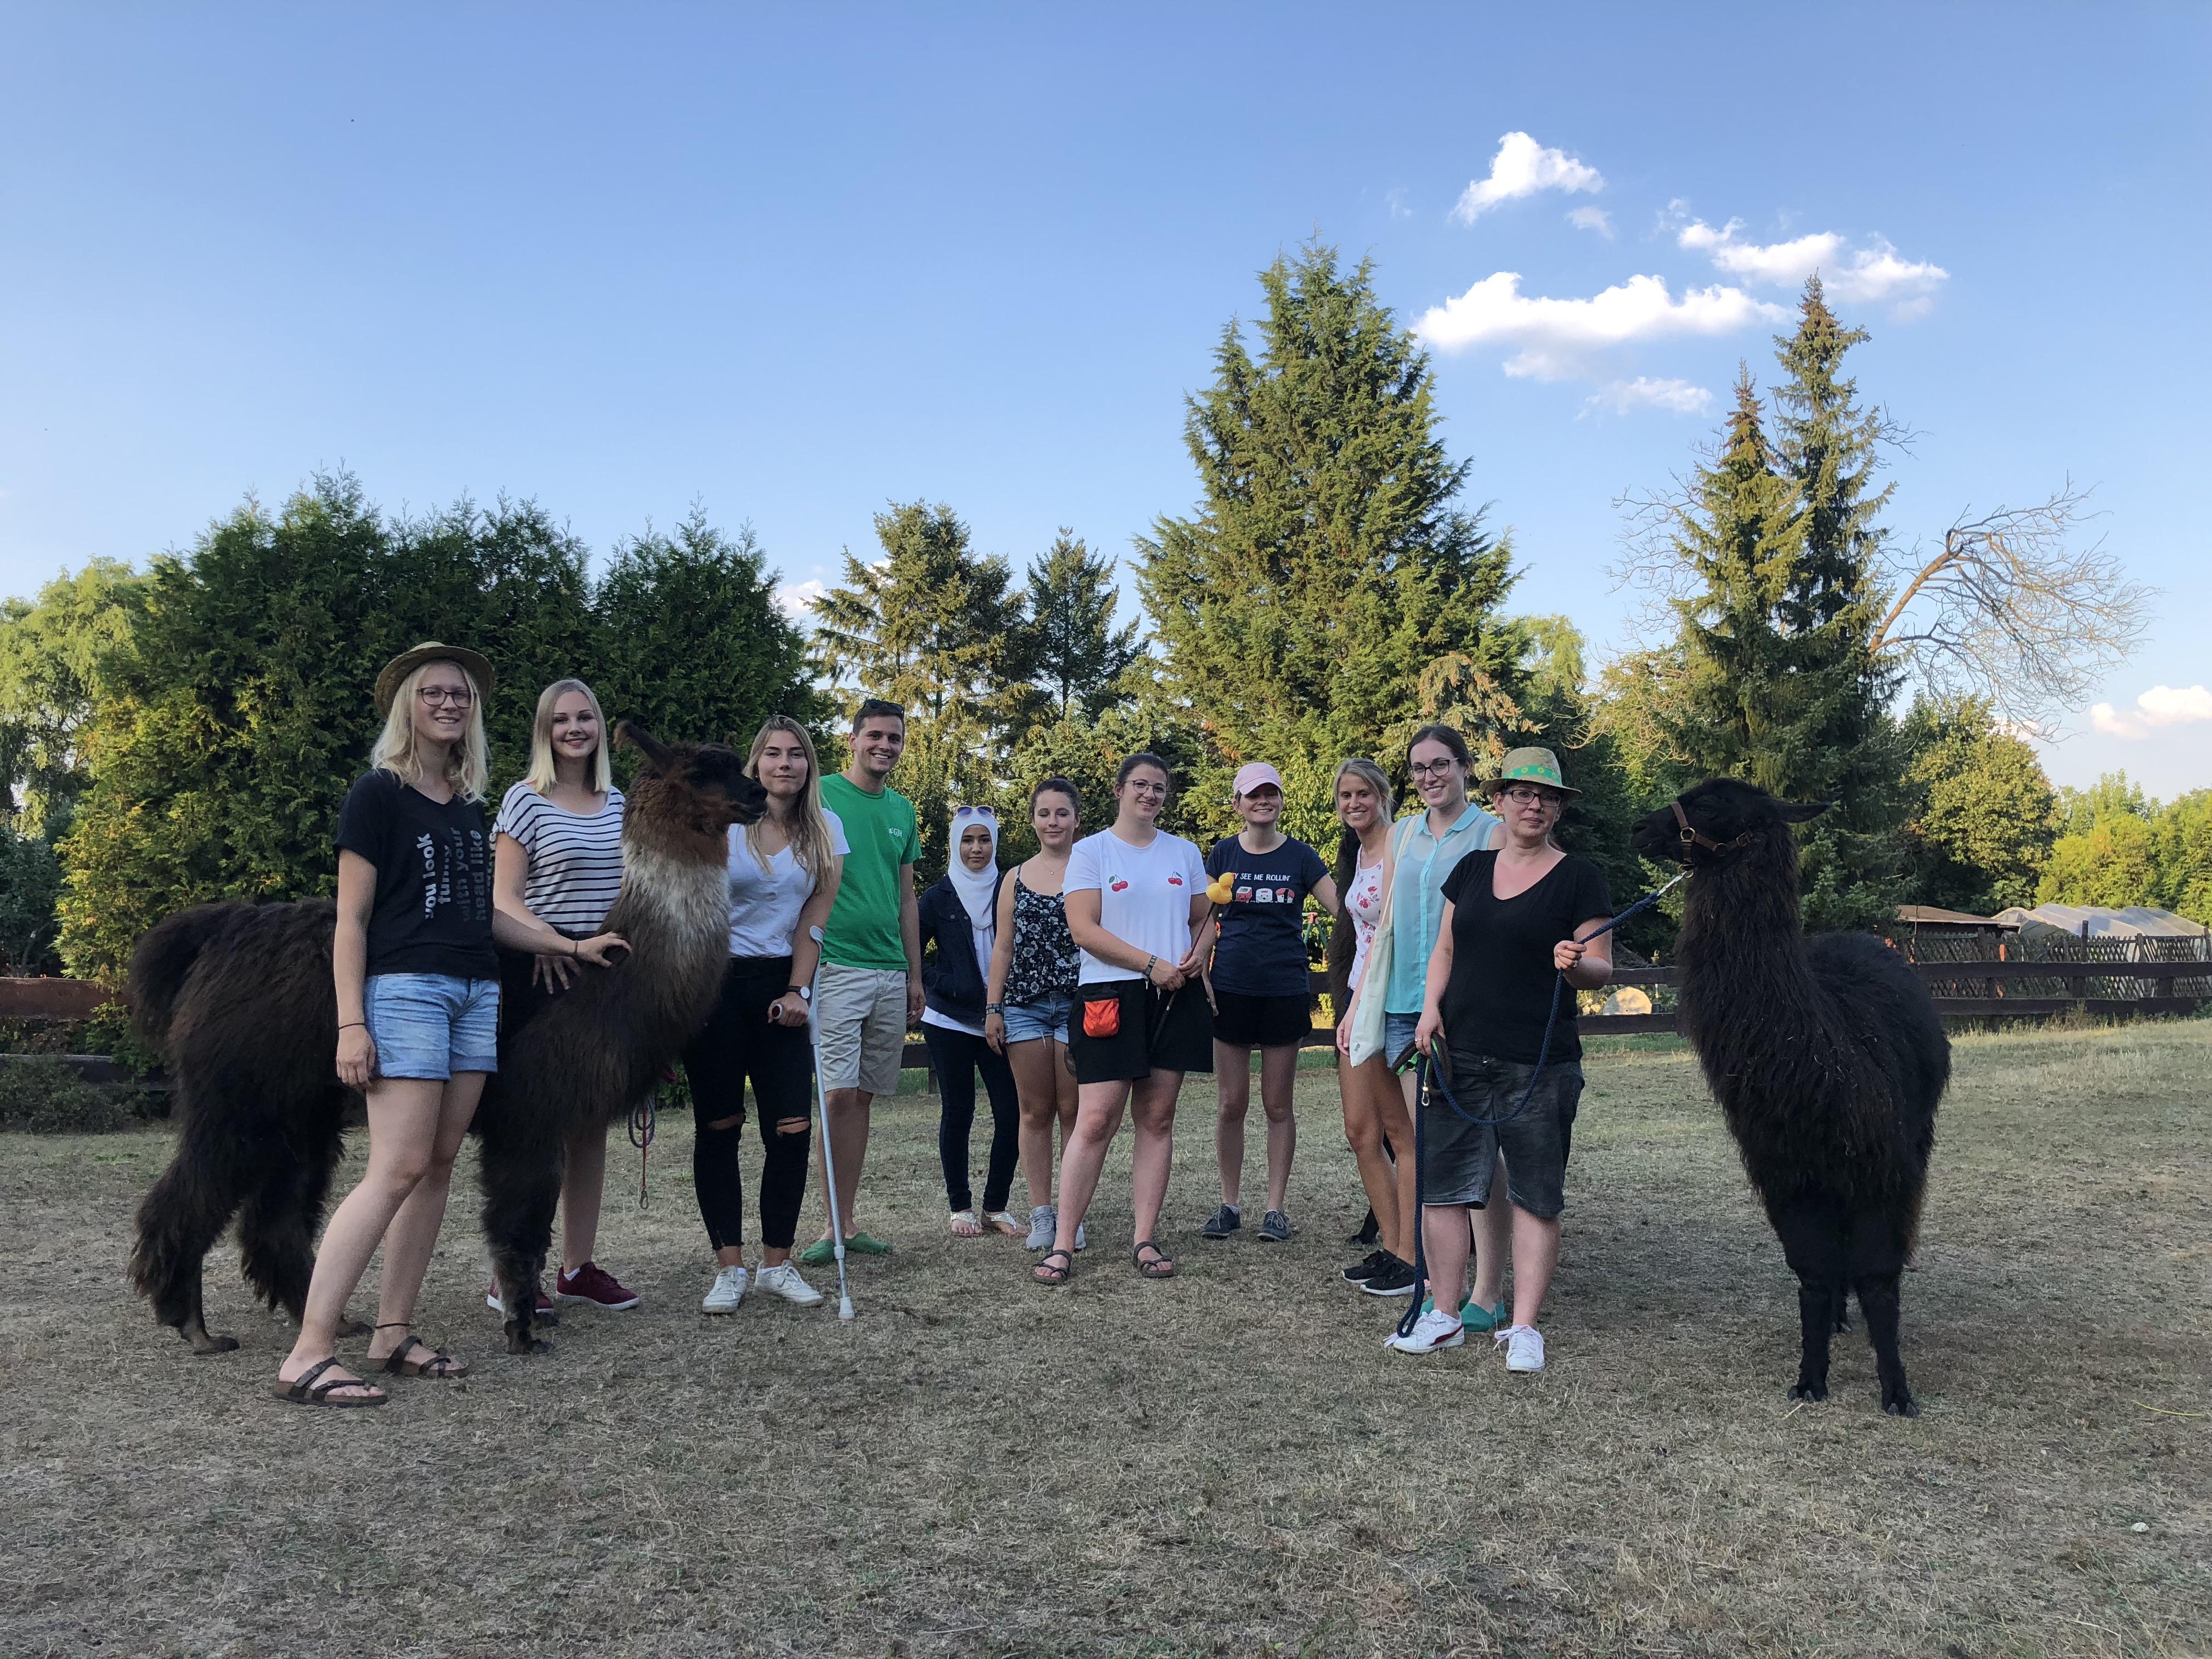 Lama-Wanderung in Lampertheim